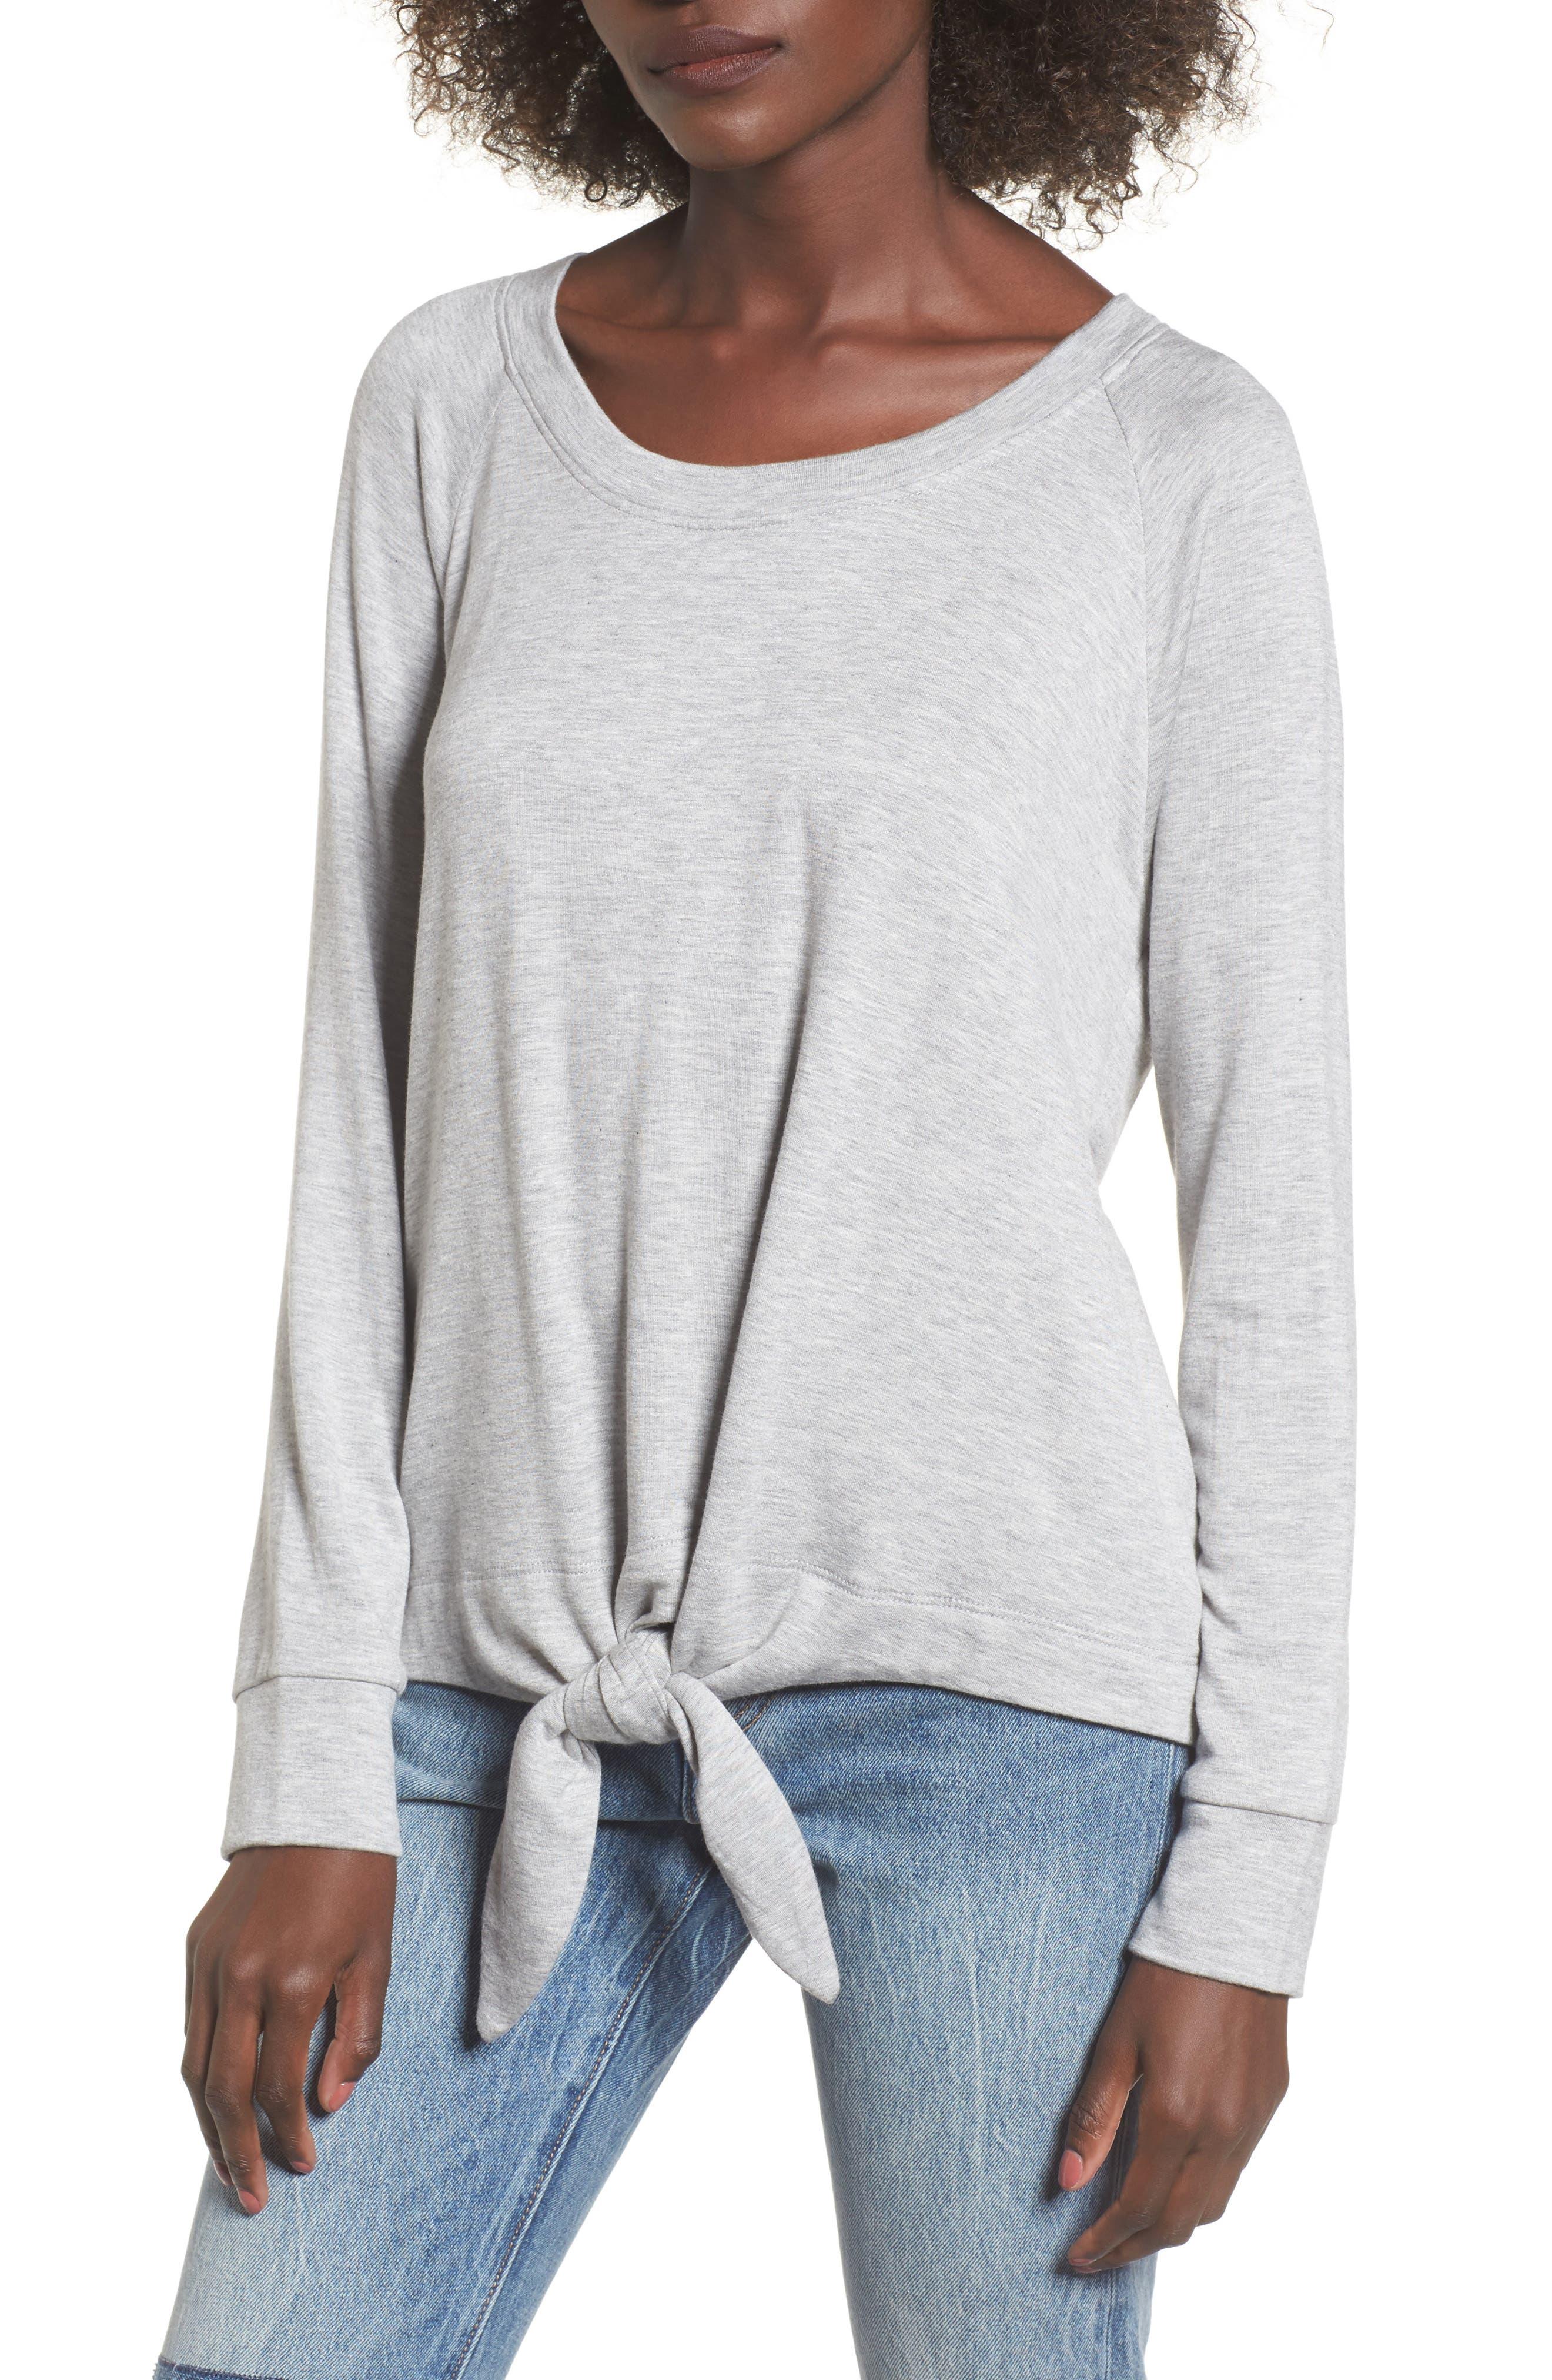 Alternate Image 1 Selected - Socialite Tie Front Sweatshirt